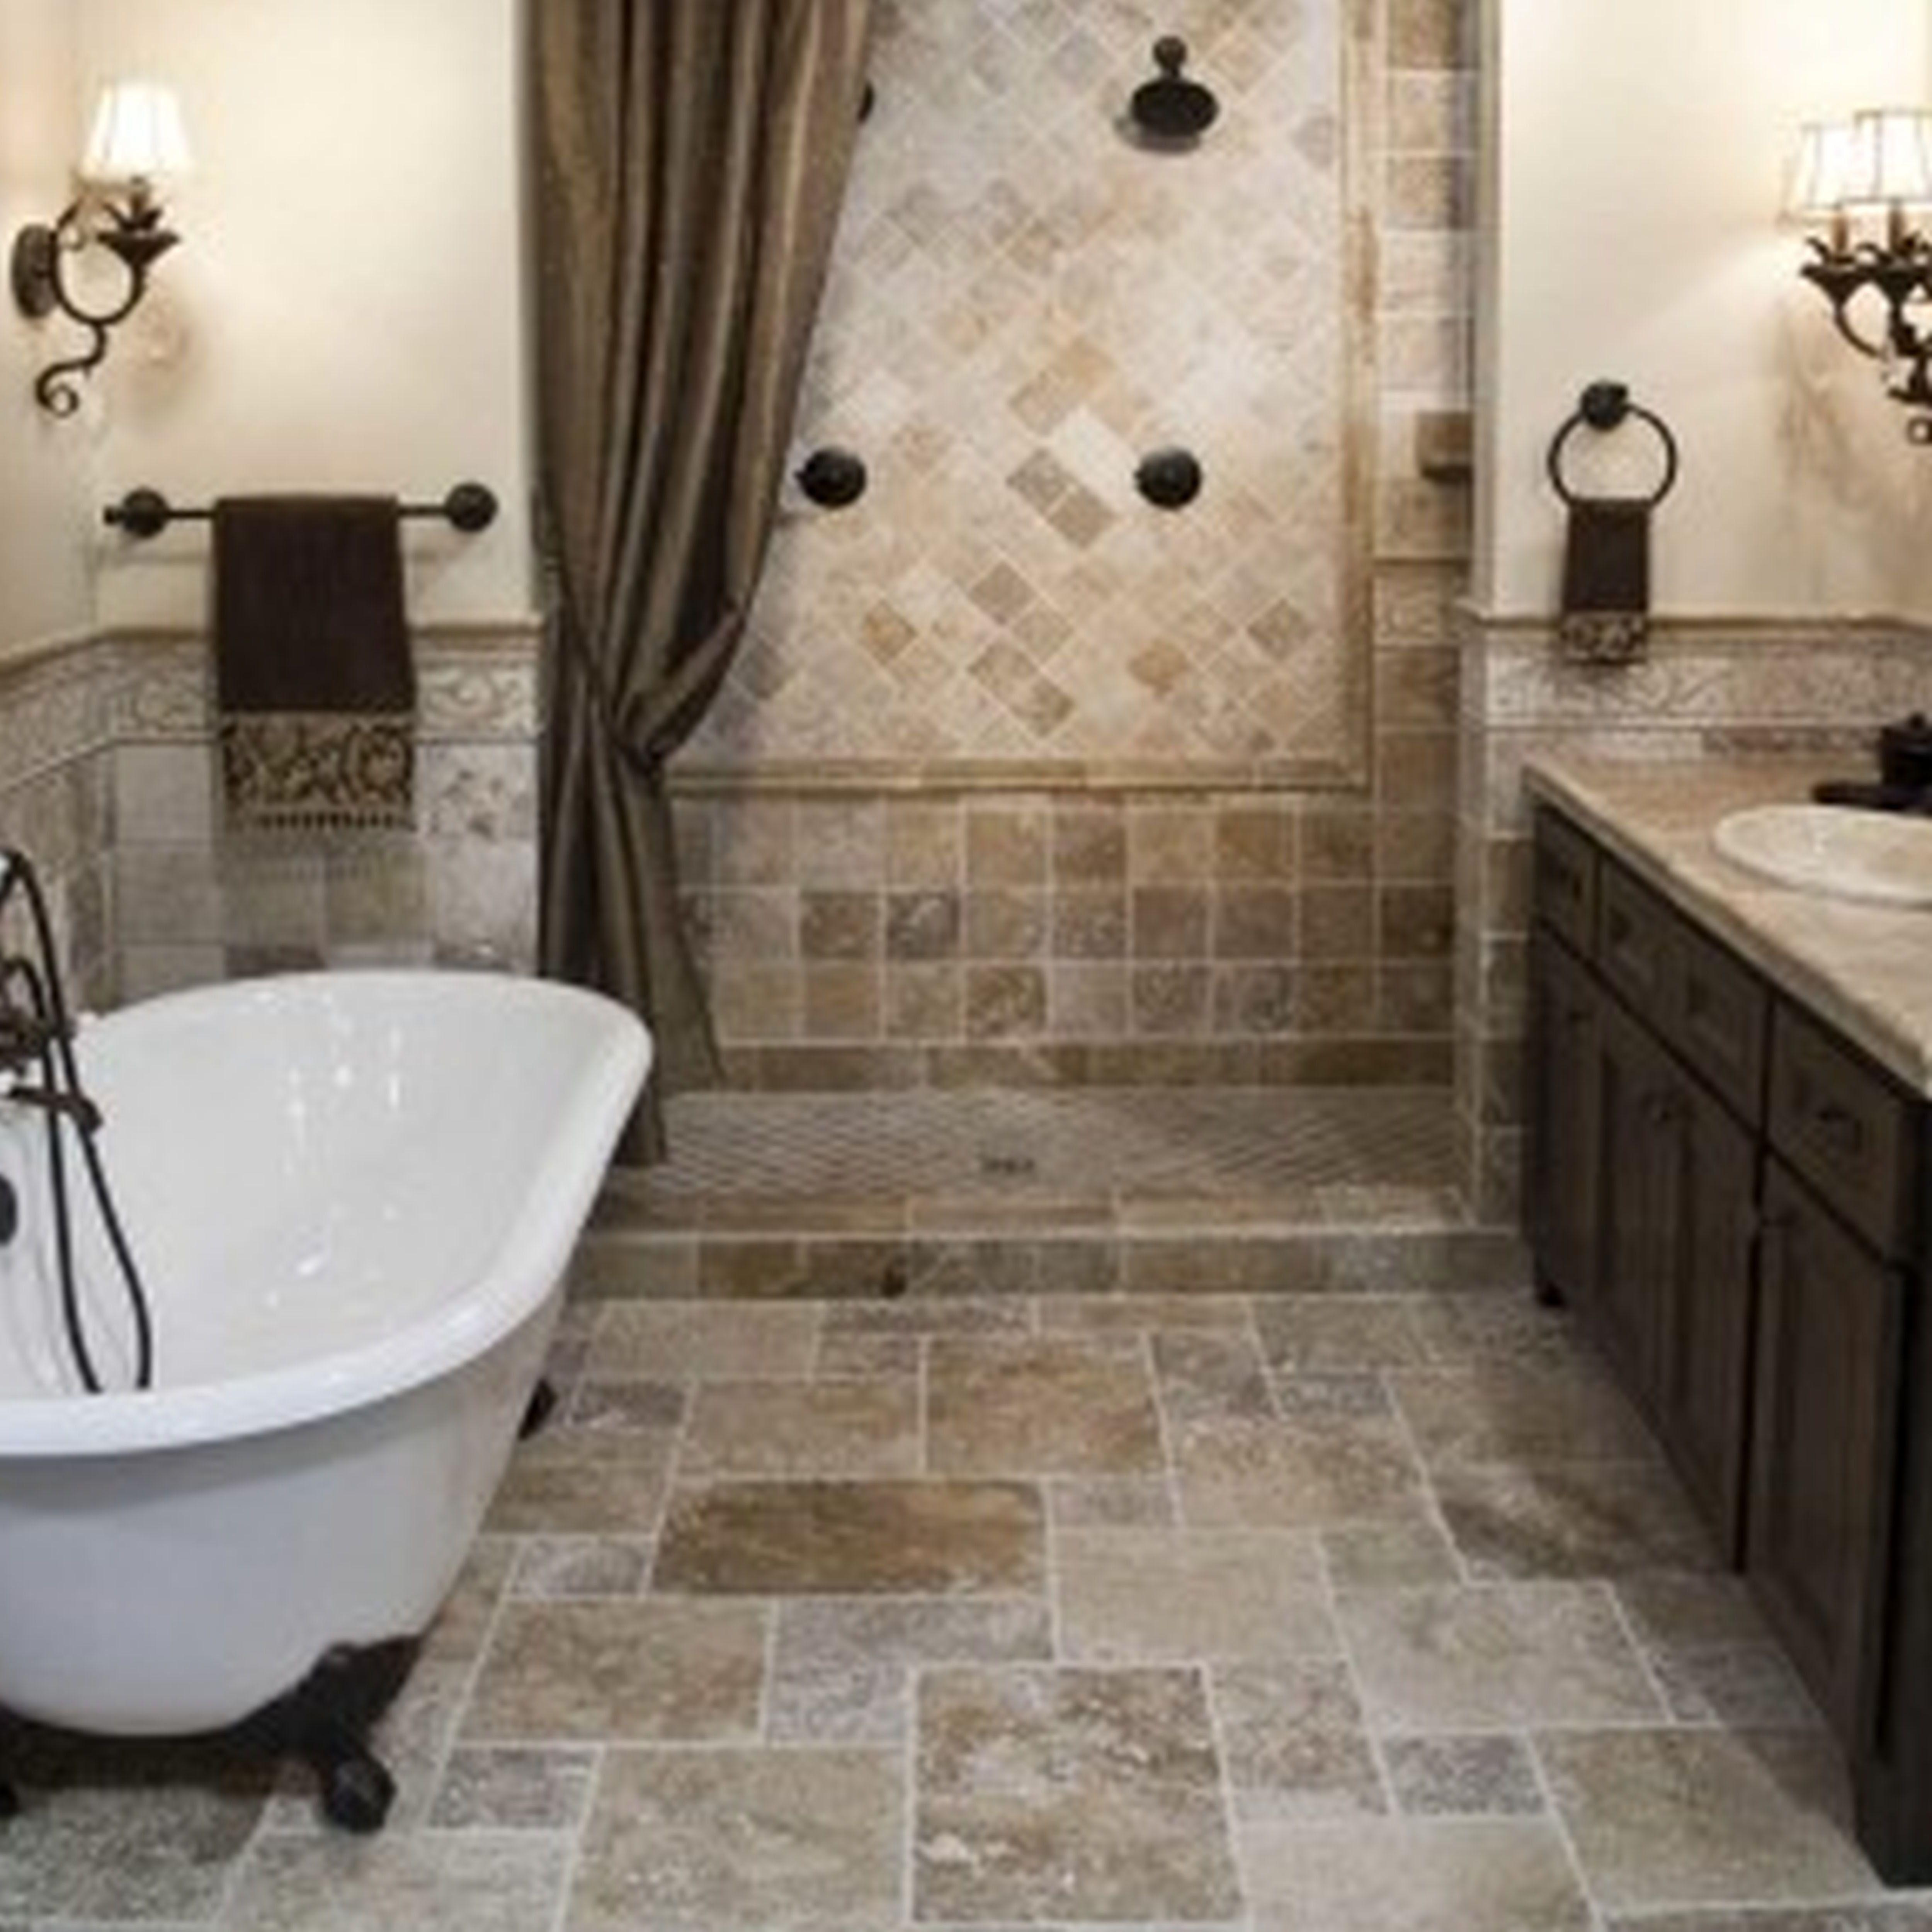 Traditional white bathroom ideas - Bathroom Traditional Interior Bathroom Design Ideas Traditional Beige Bathroom Idea Feature Freestanding White Oval